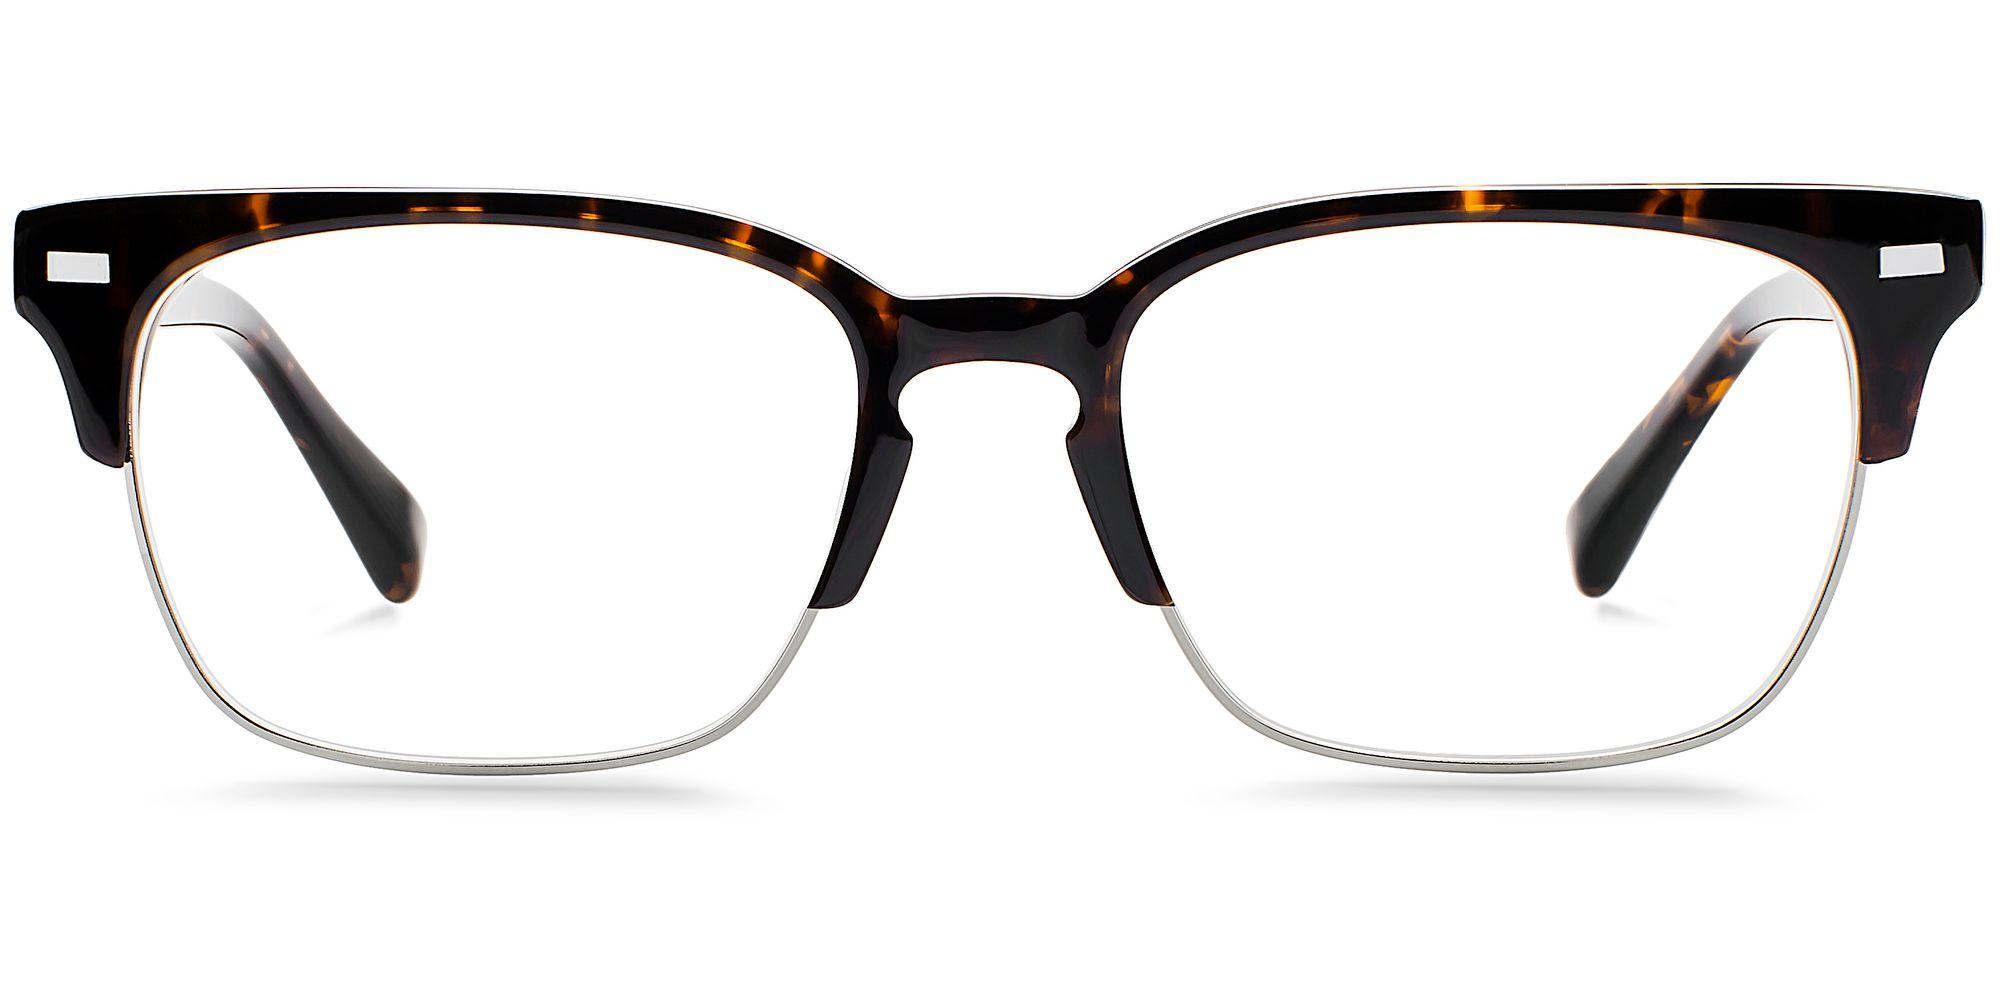 Warby Parker Ames Eyeglasses in Whiskey Tortoise for Men